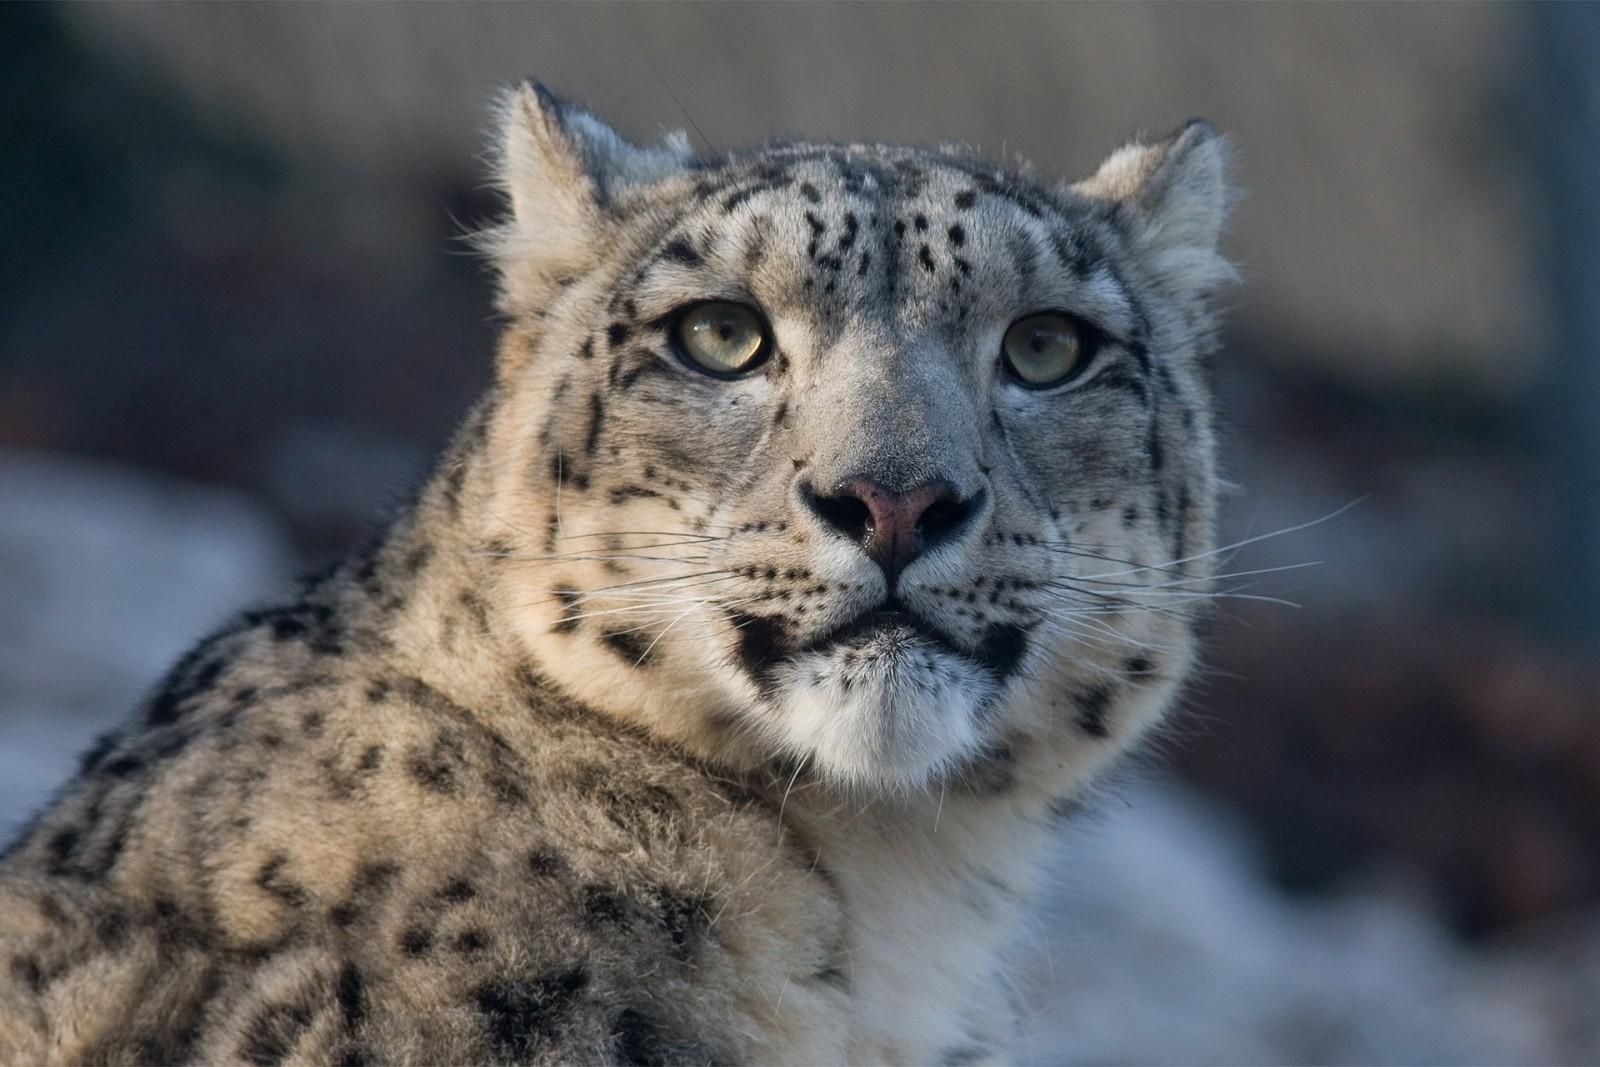 snow-leopard-725384_1920